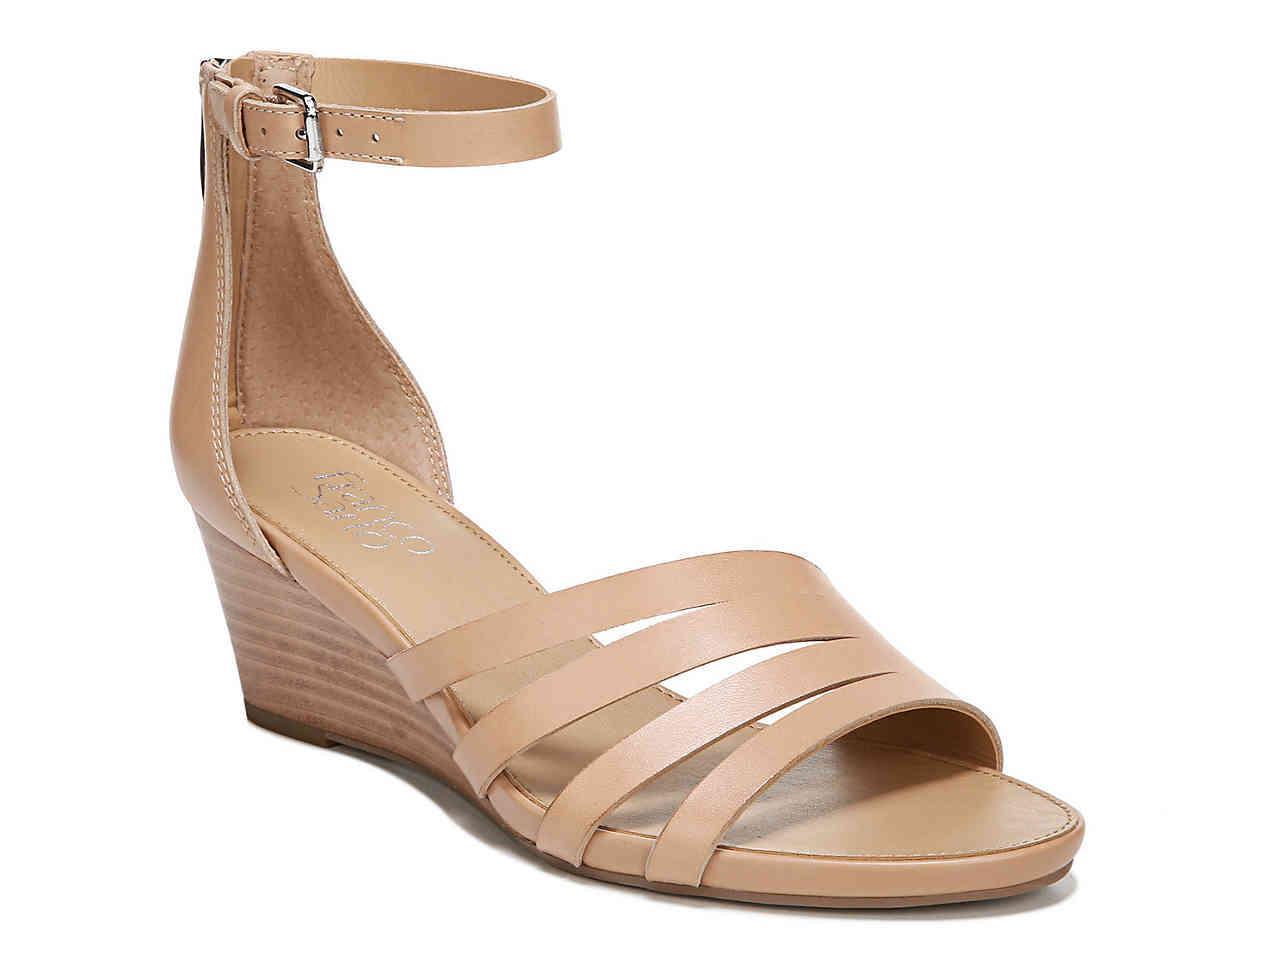 60b66e61db4 Lyst - Franco Sarto Dutch Wedge Sandal in Natural